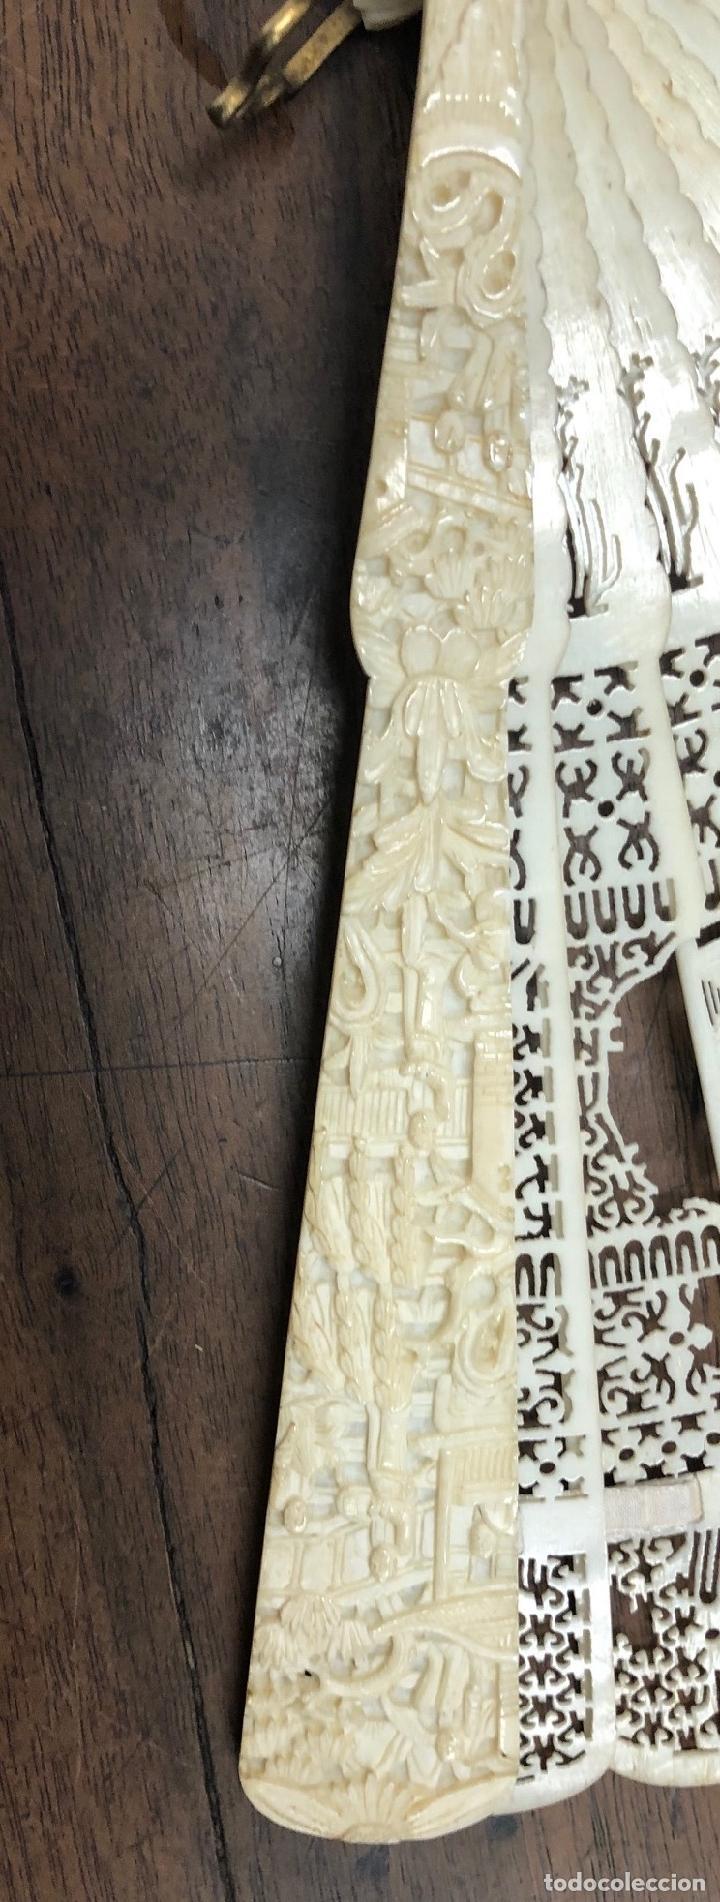 Antigüedades: ESPECTACULAR ABANICO EN RELIEVE INTEGRAMENTE REALIZADO EN MARFIL - Foto 5 - 237481740